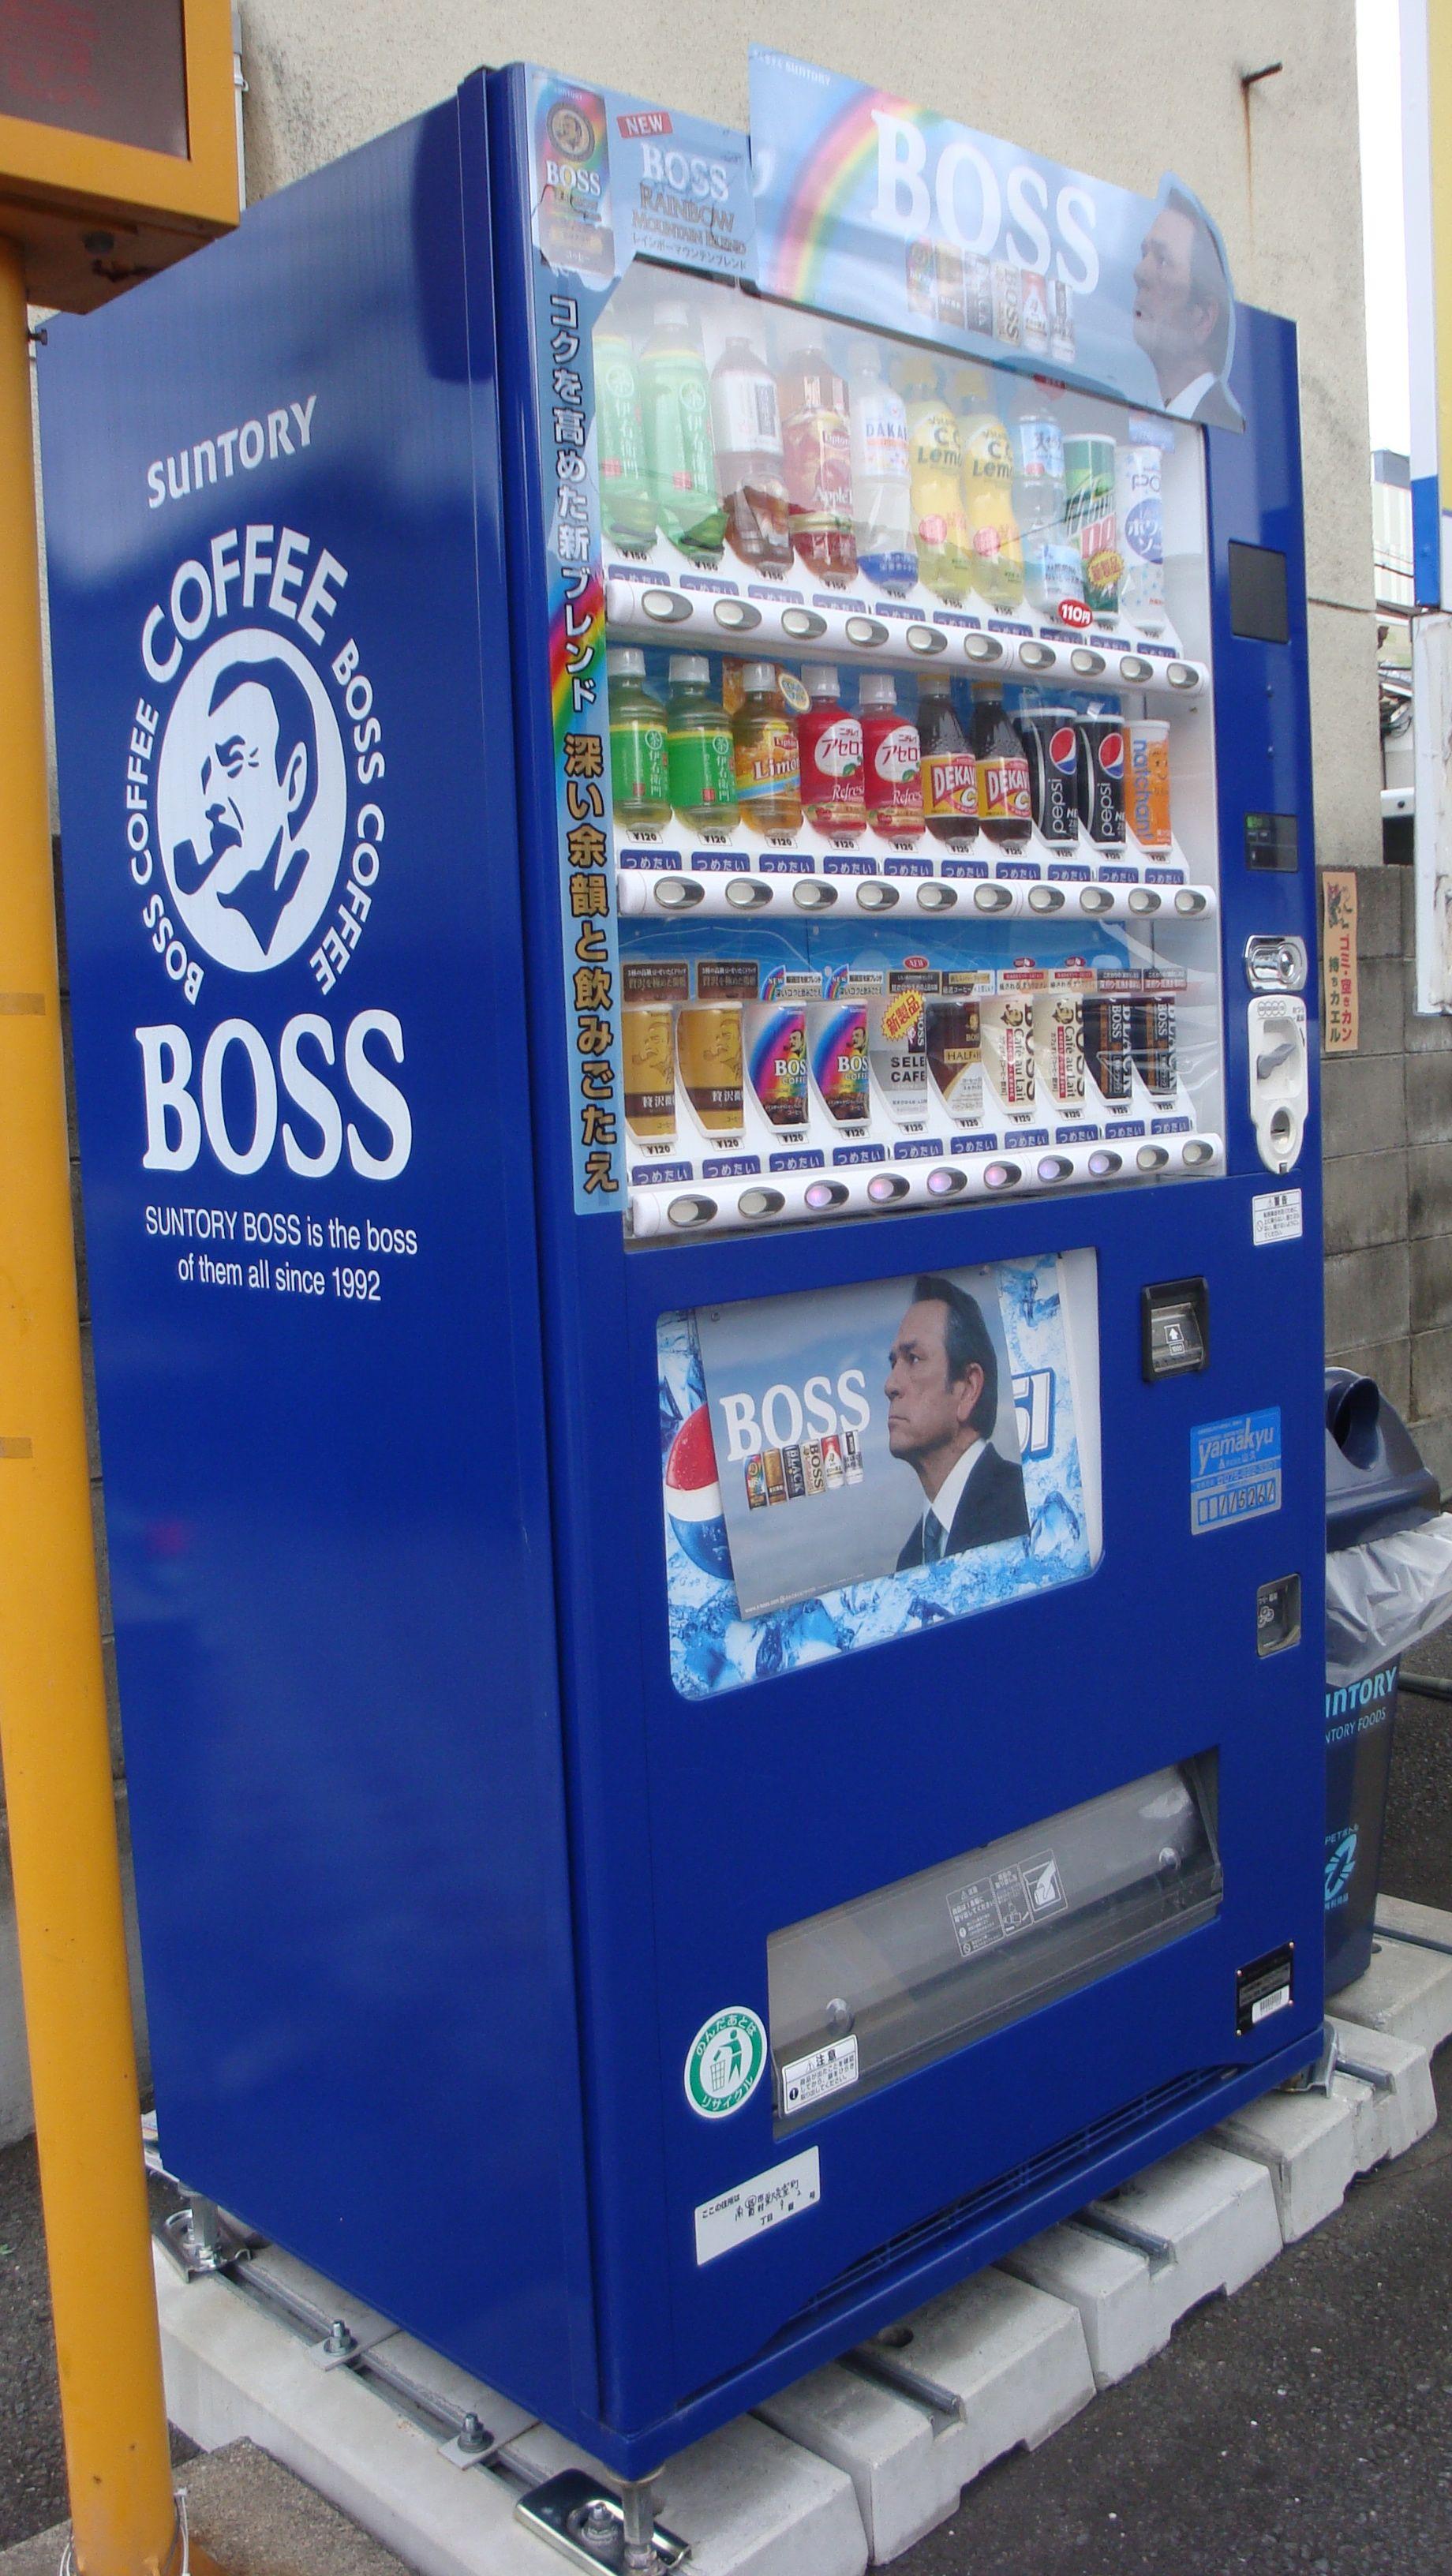 Japanese Vending Machines Vending Machines In Japan Vending